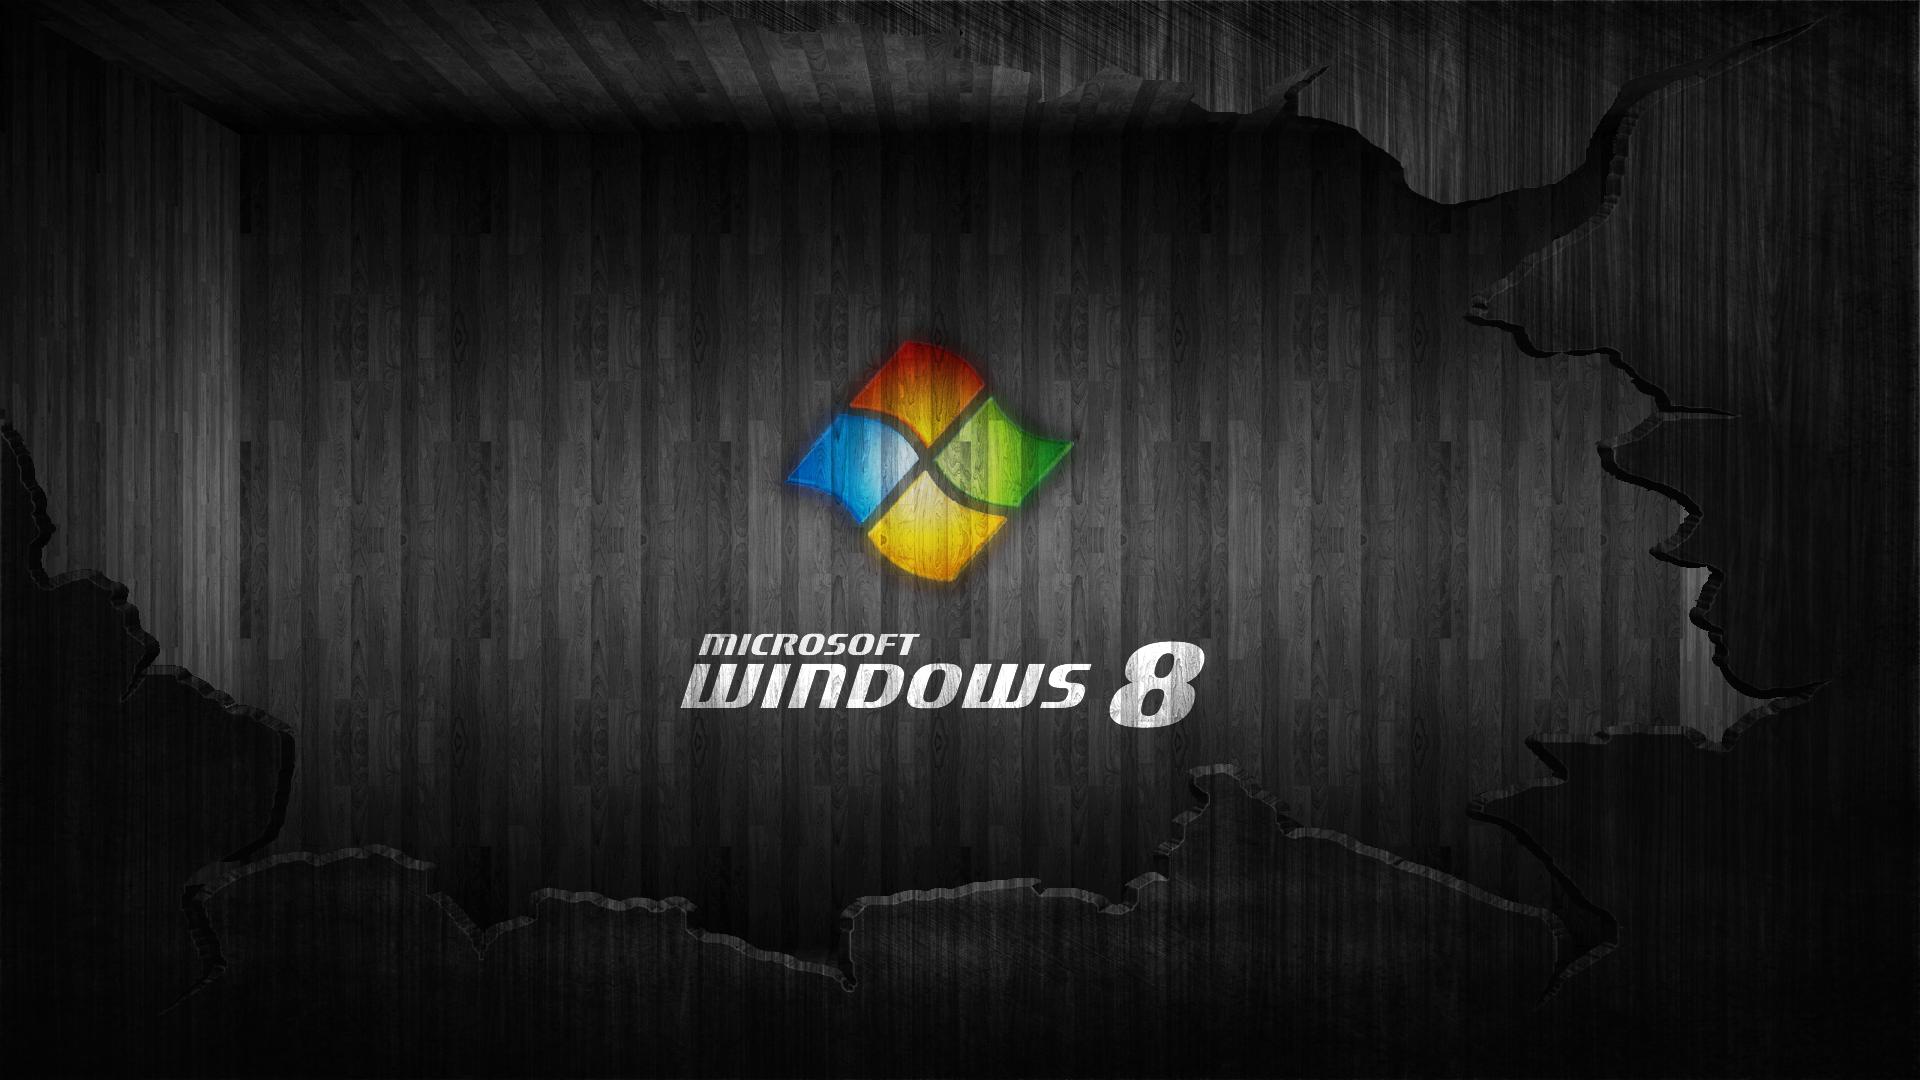 windows wallpapers desktop background widescreen wallpaper logo 1920x1080